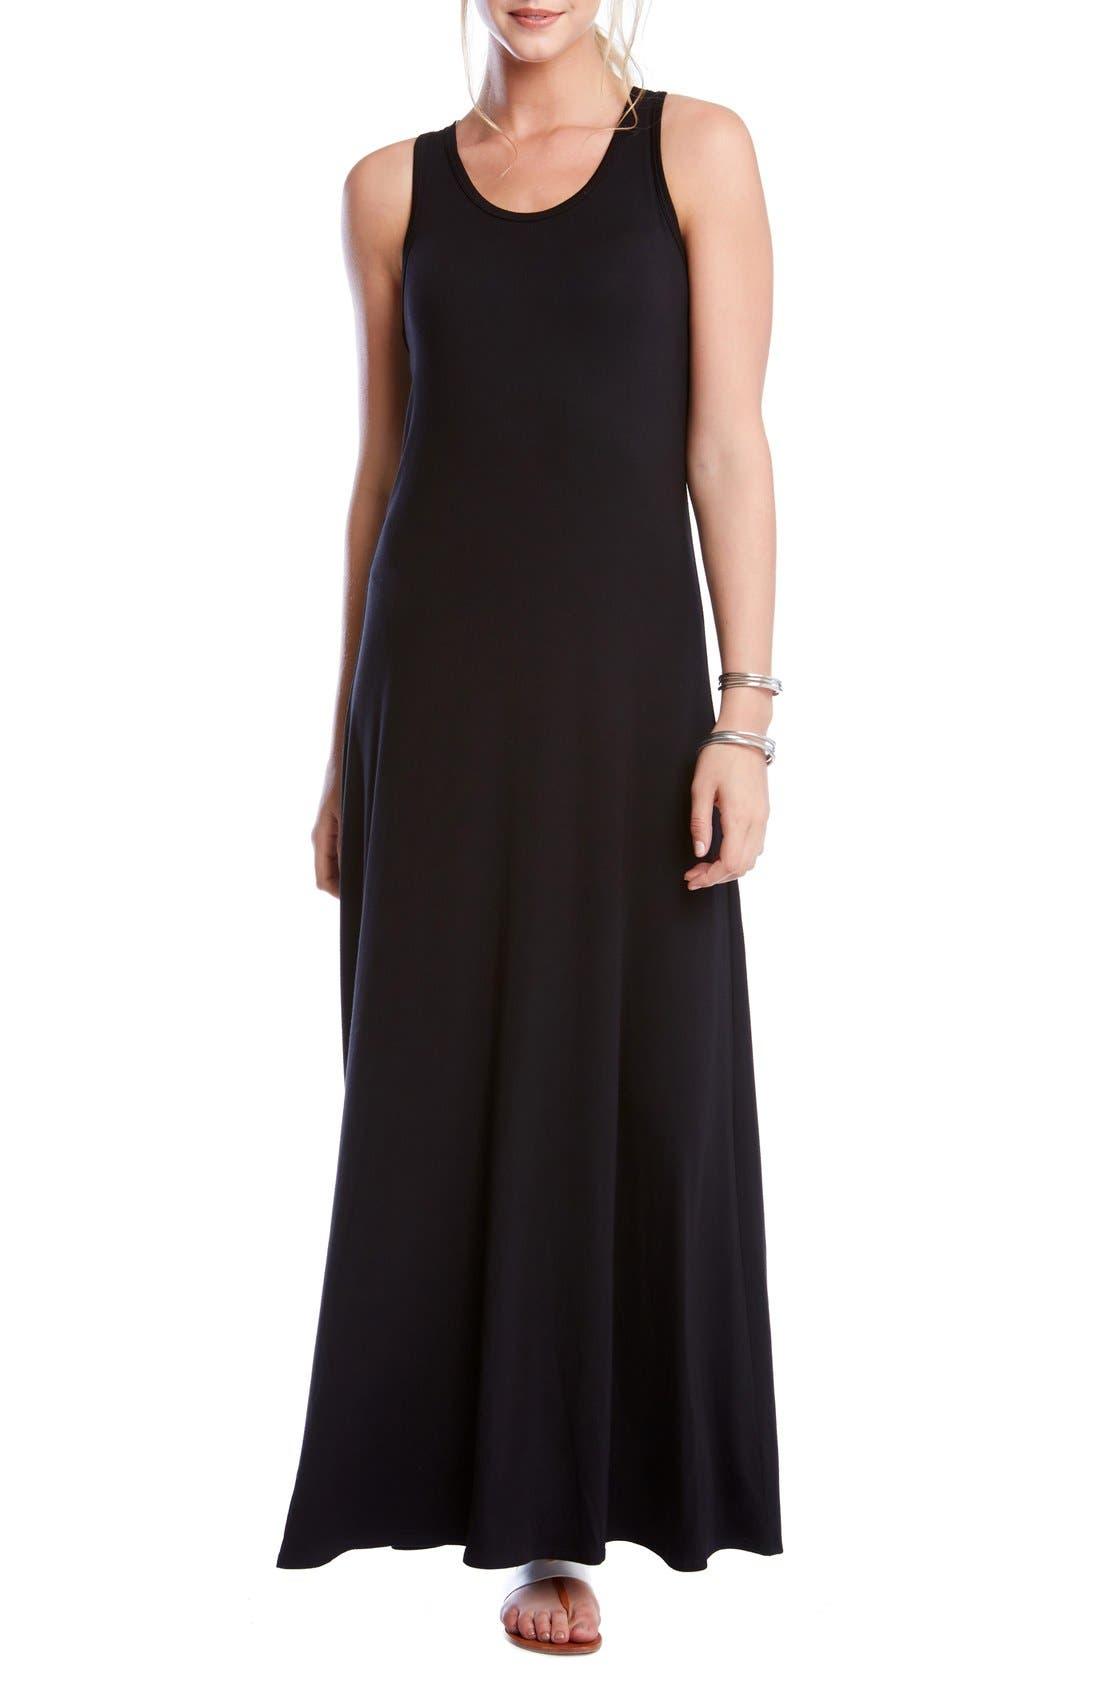 Main Image - Karen Kane 'Tasha' Racerback Jersey Maxi Dress